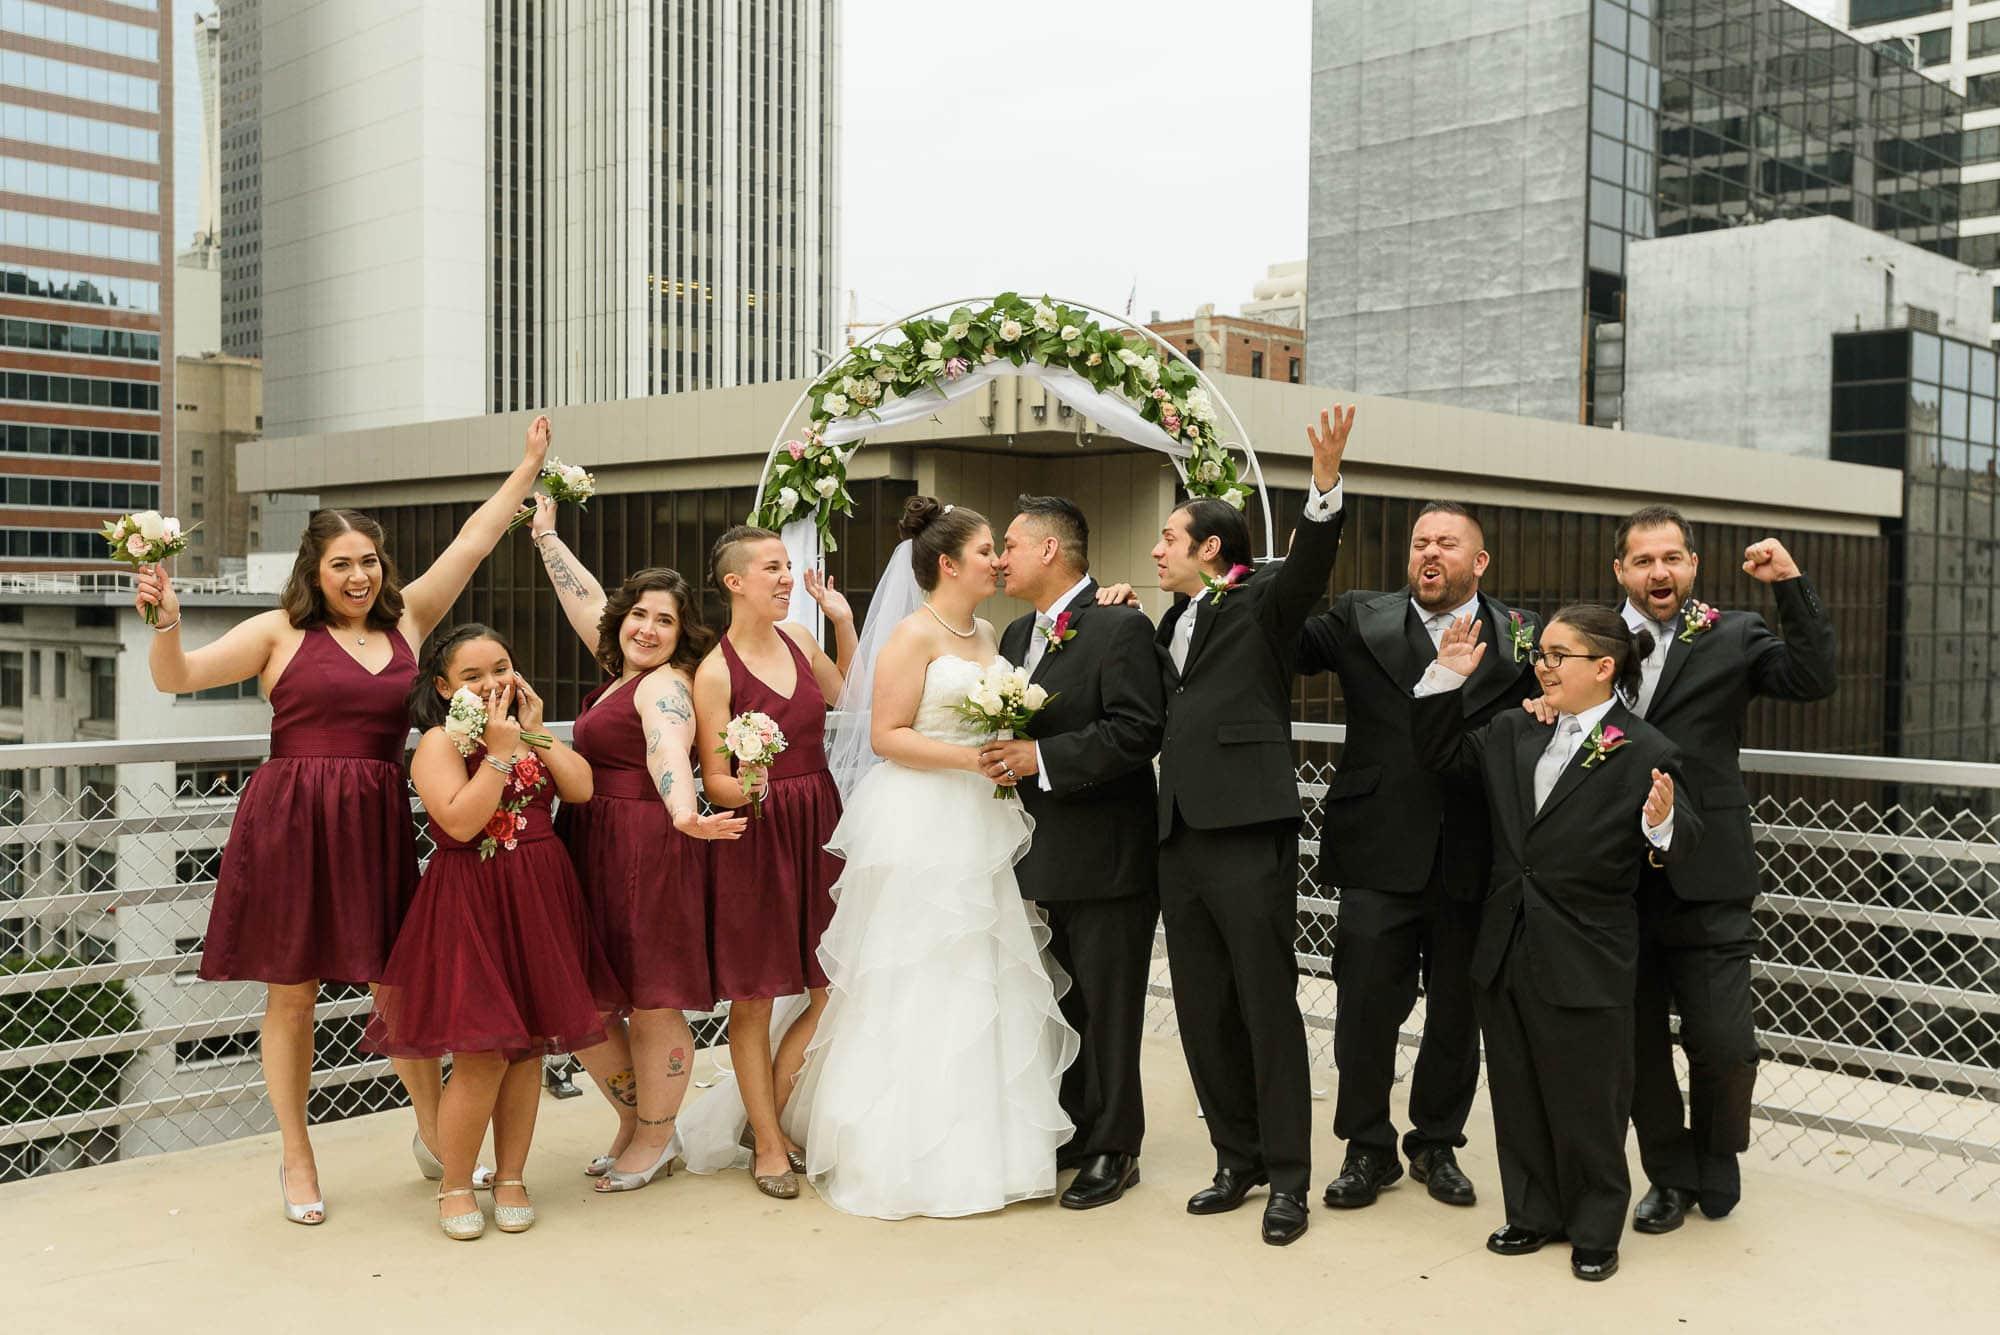 024_Alan_and_Heidi_Wedding_Nicole_Roman